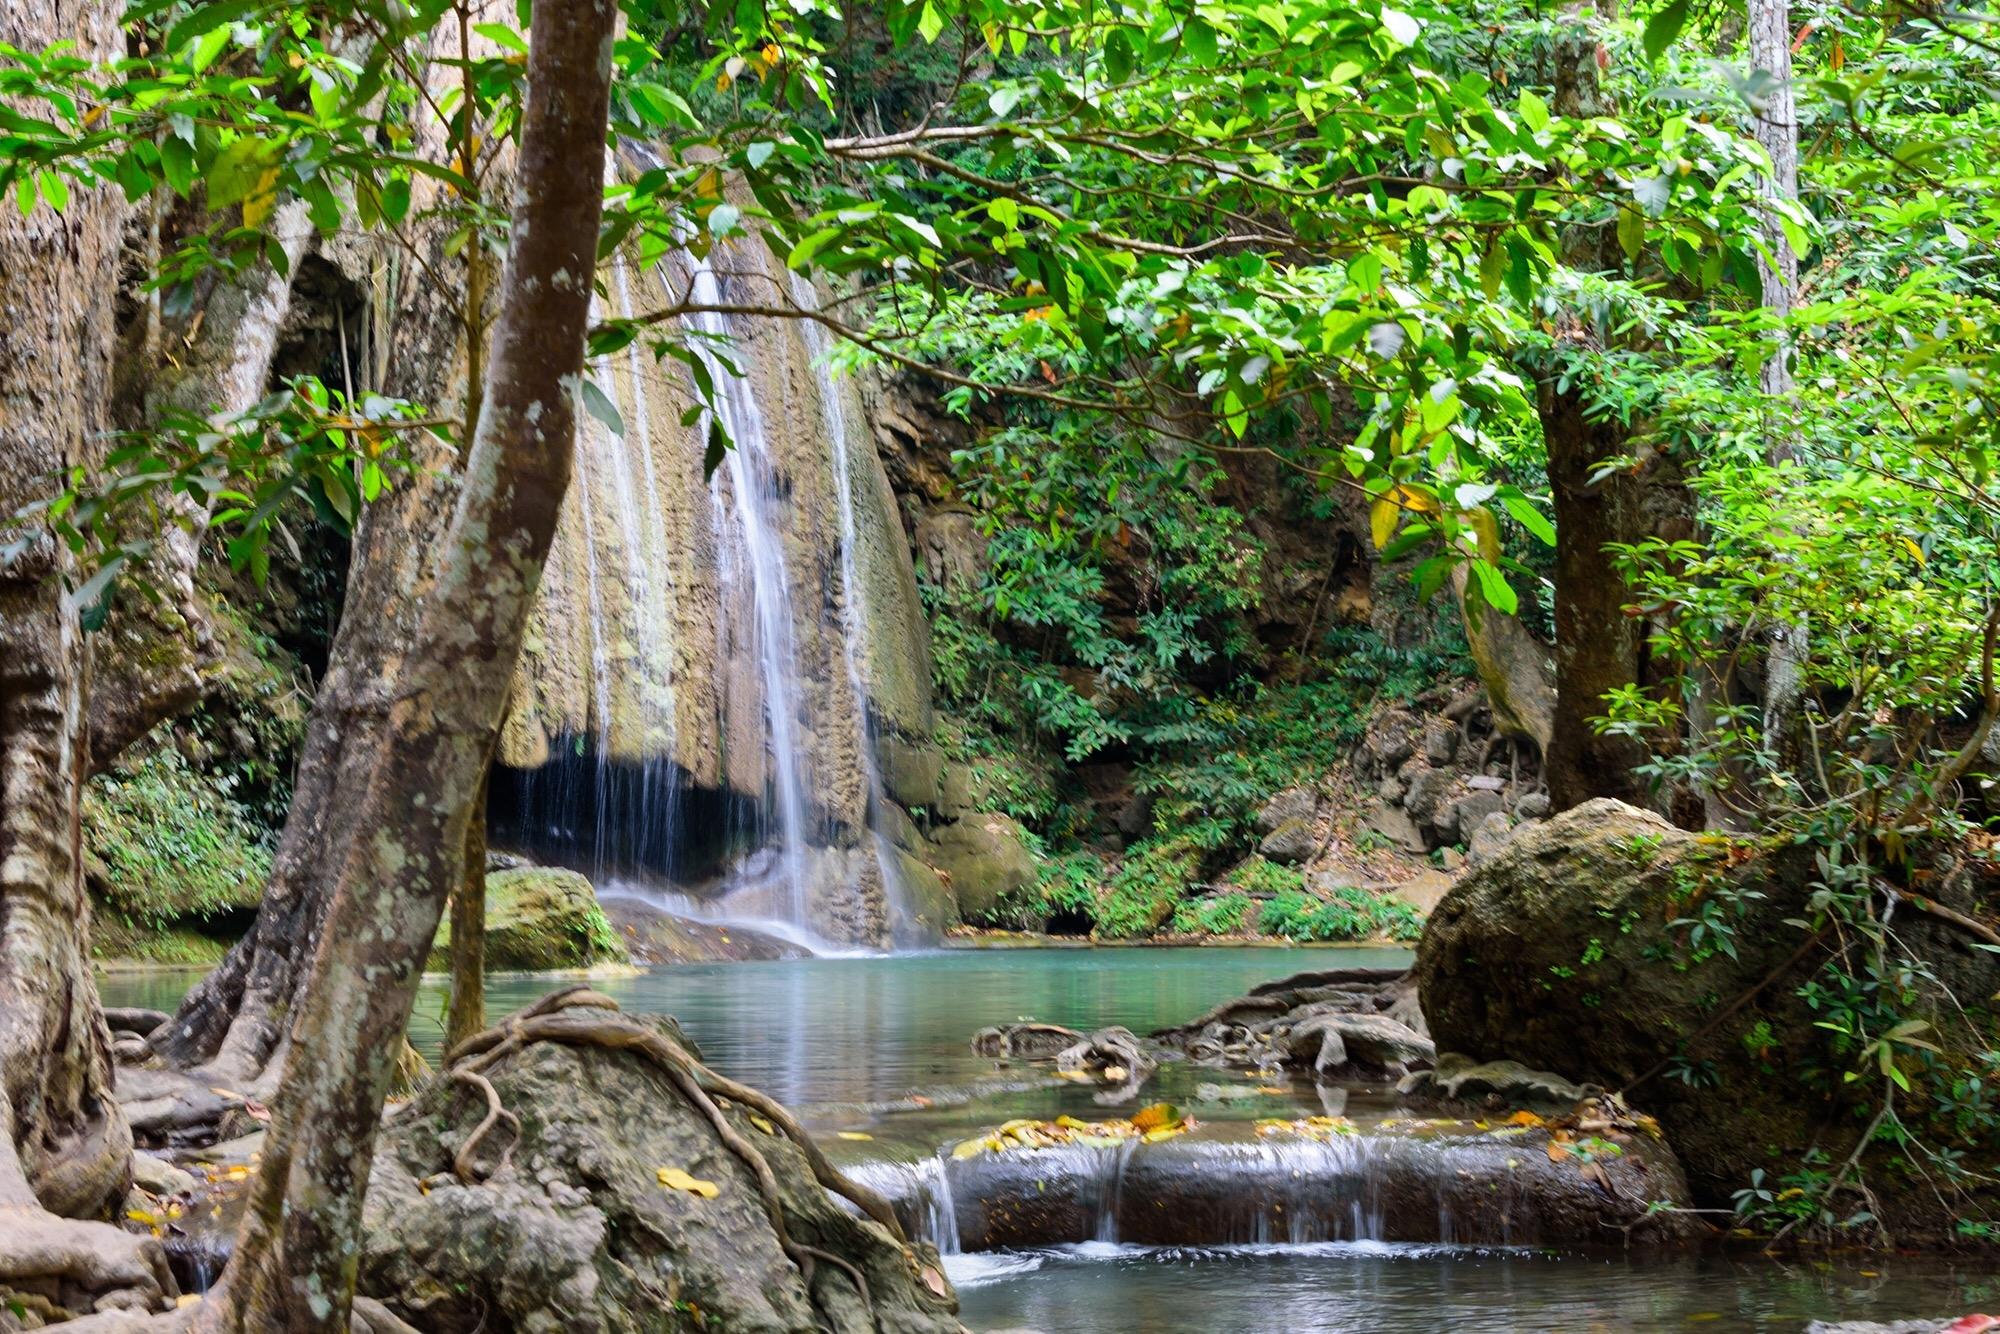 Erawan Waterfall and Kanchanaburi Highlights Tour from Bangkok